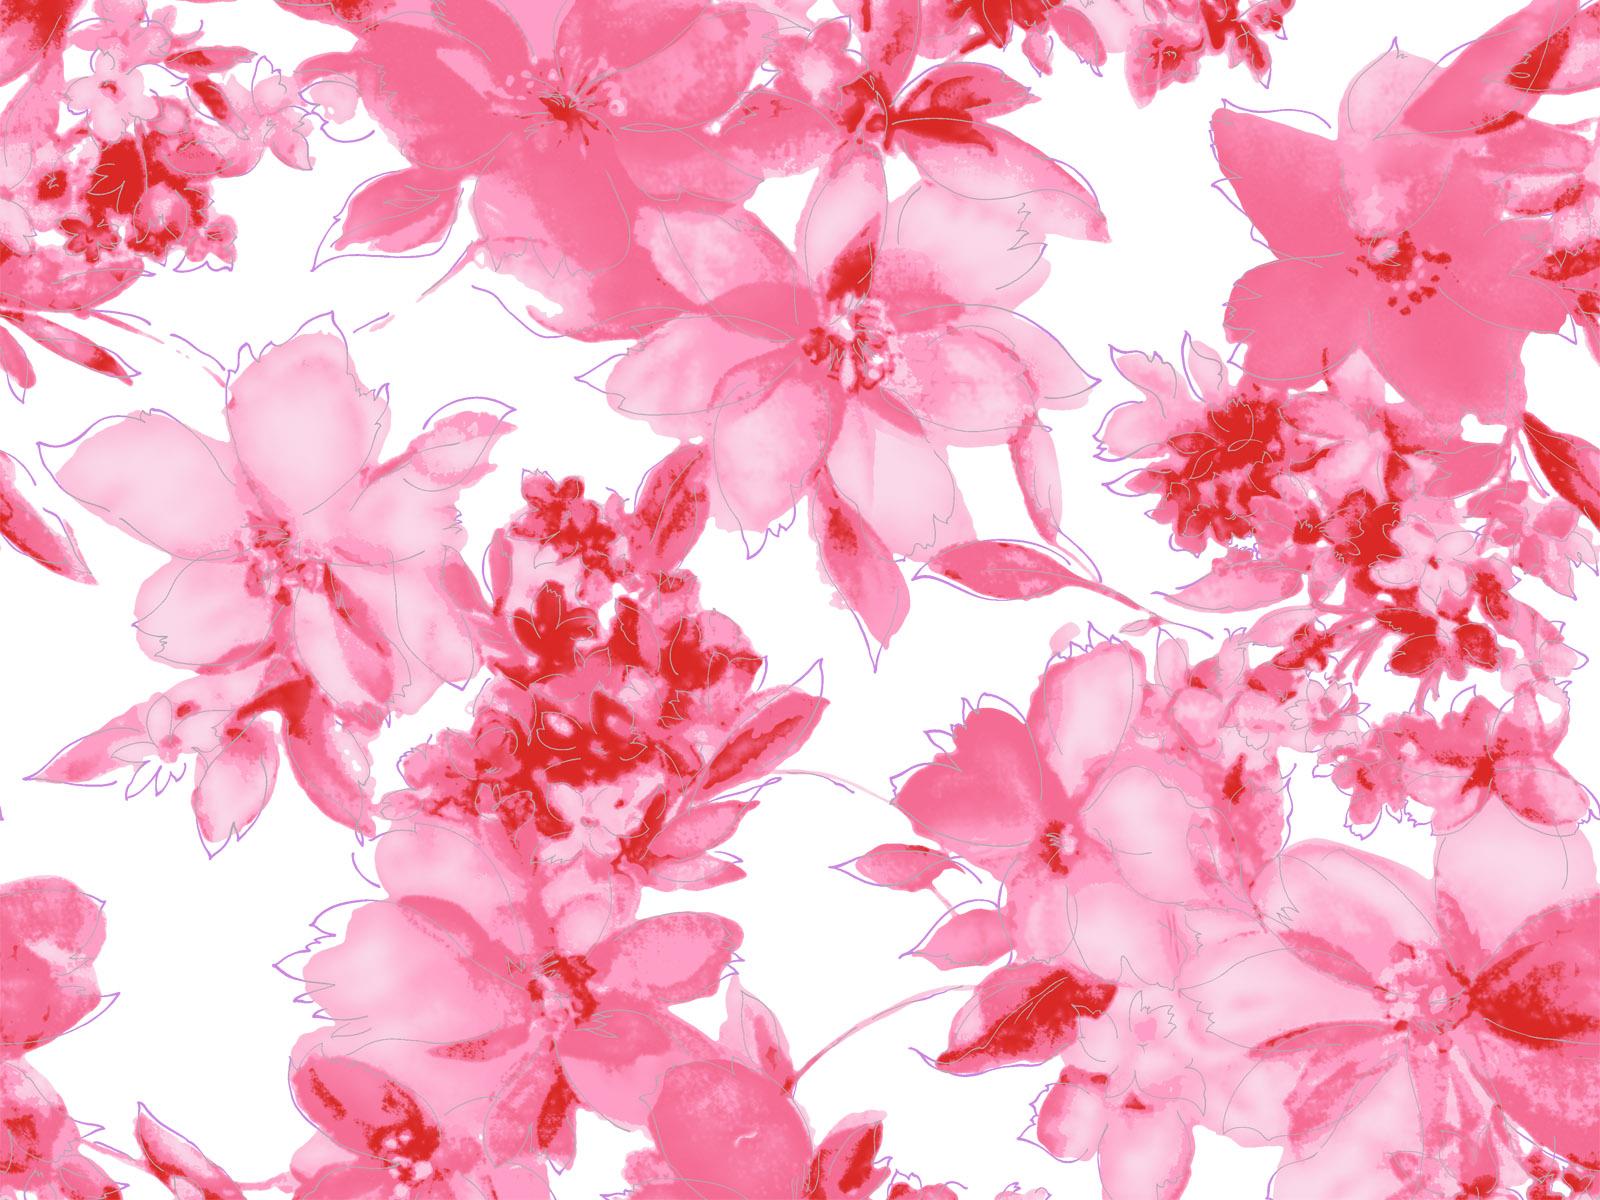 flowers wallpaper glow flowers wallpaper beautiful rosses wallpaper 1600x1200